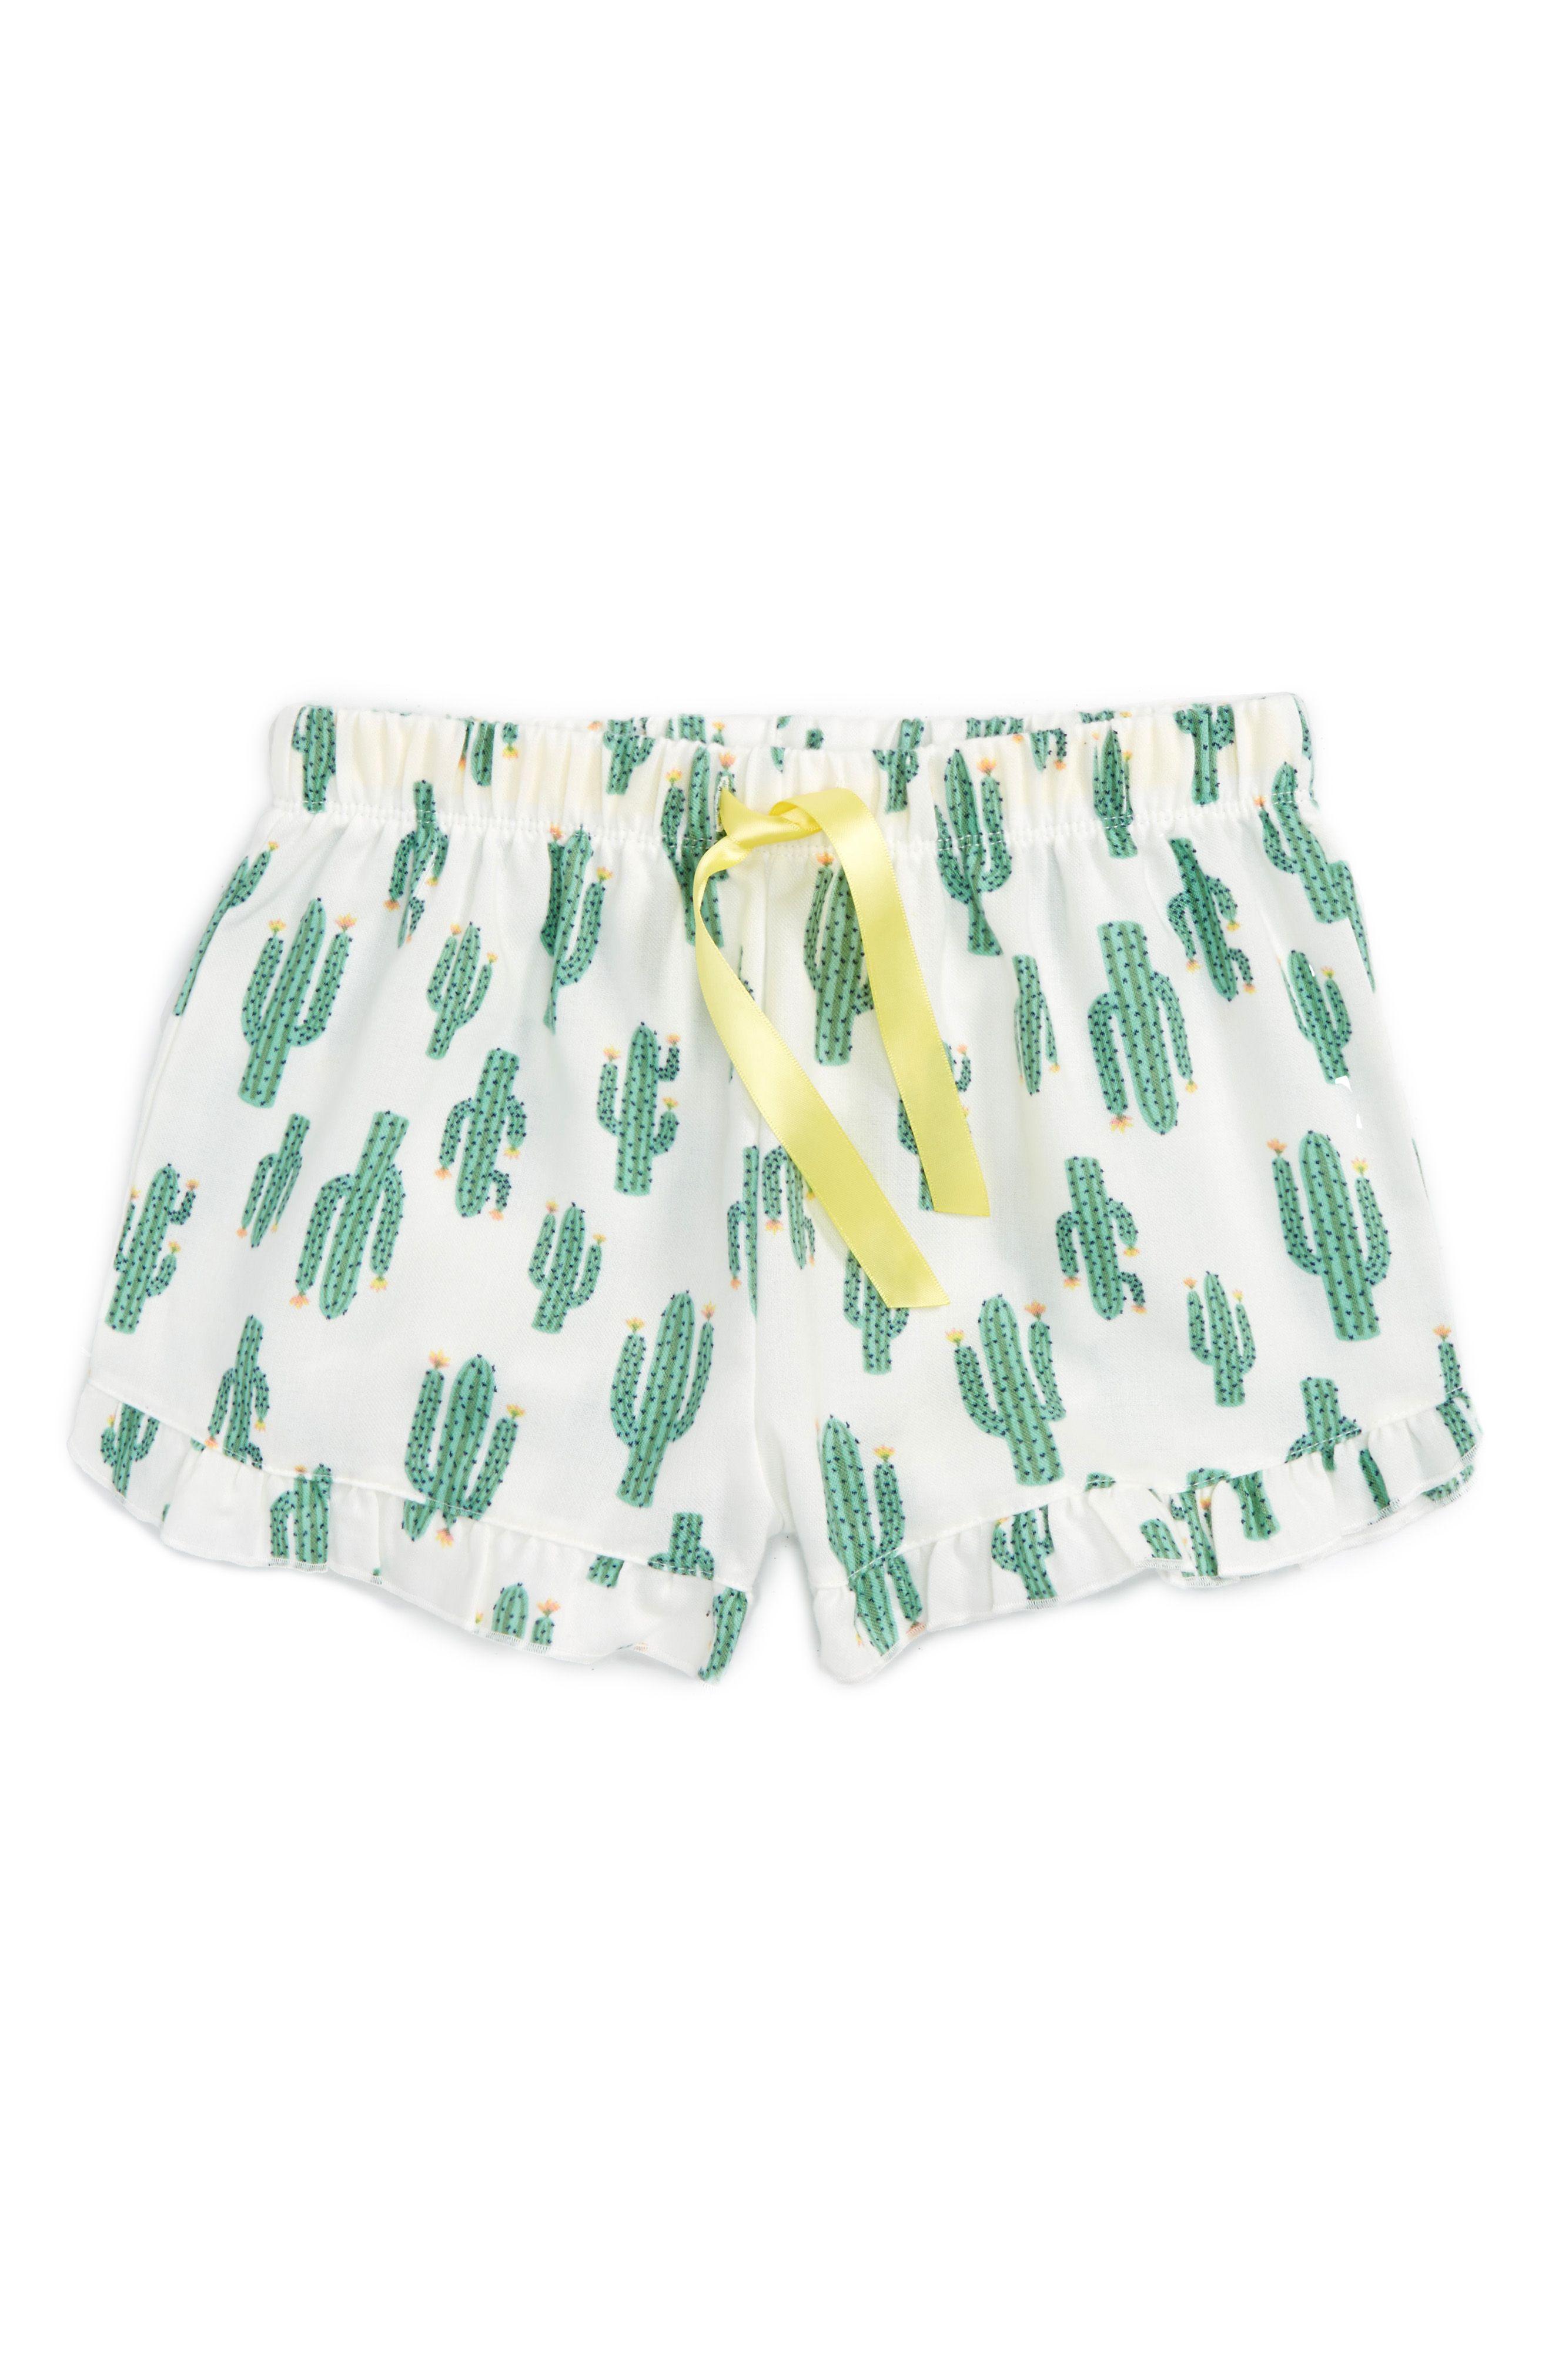 cute pajama shorts